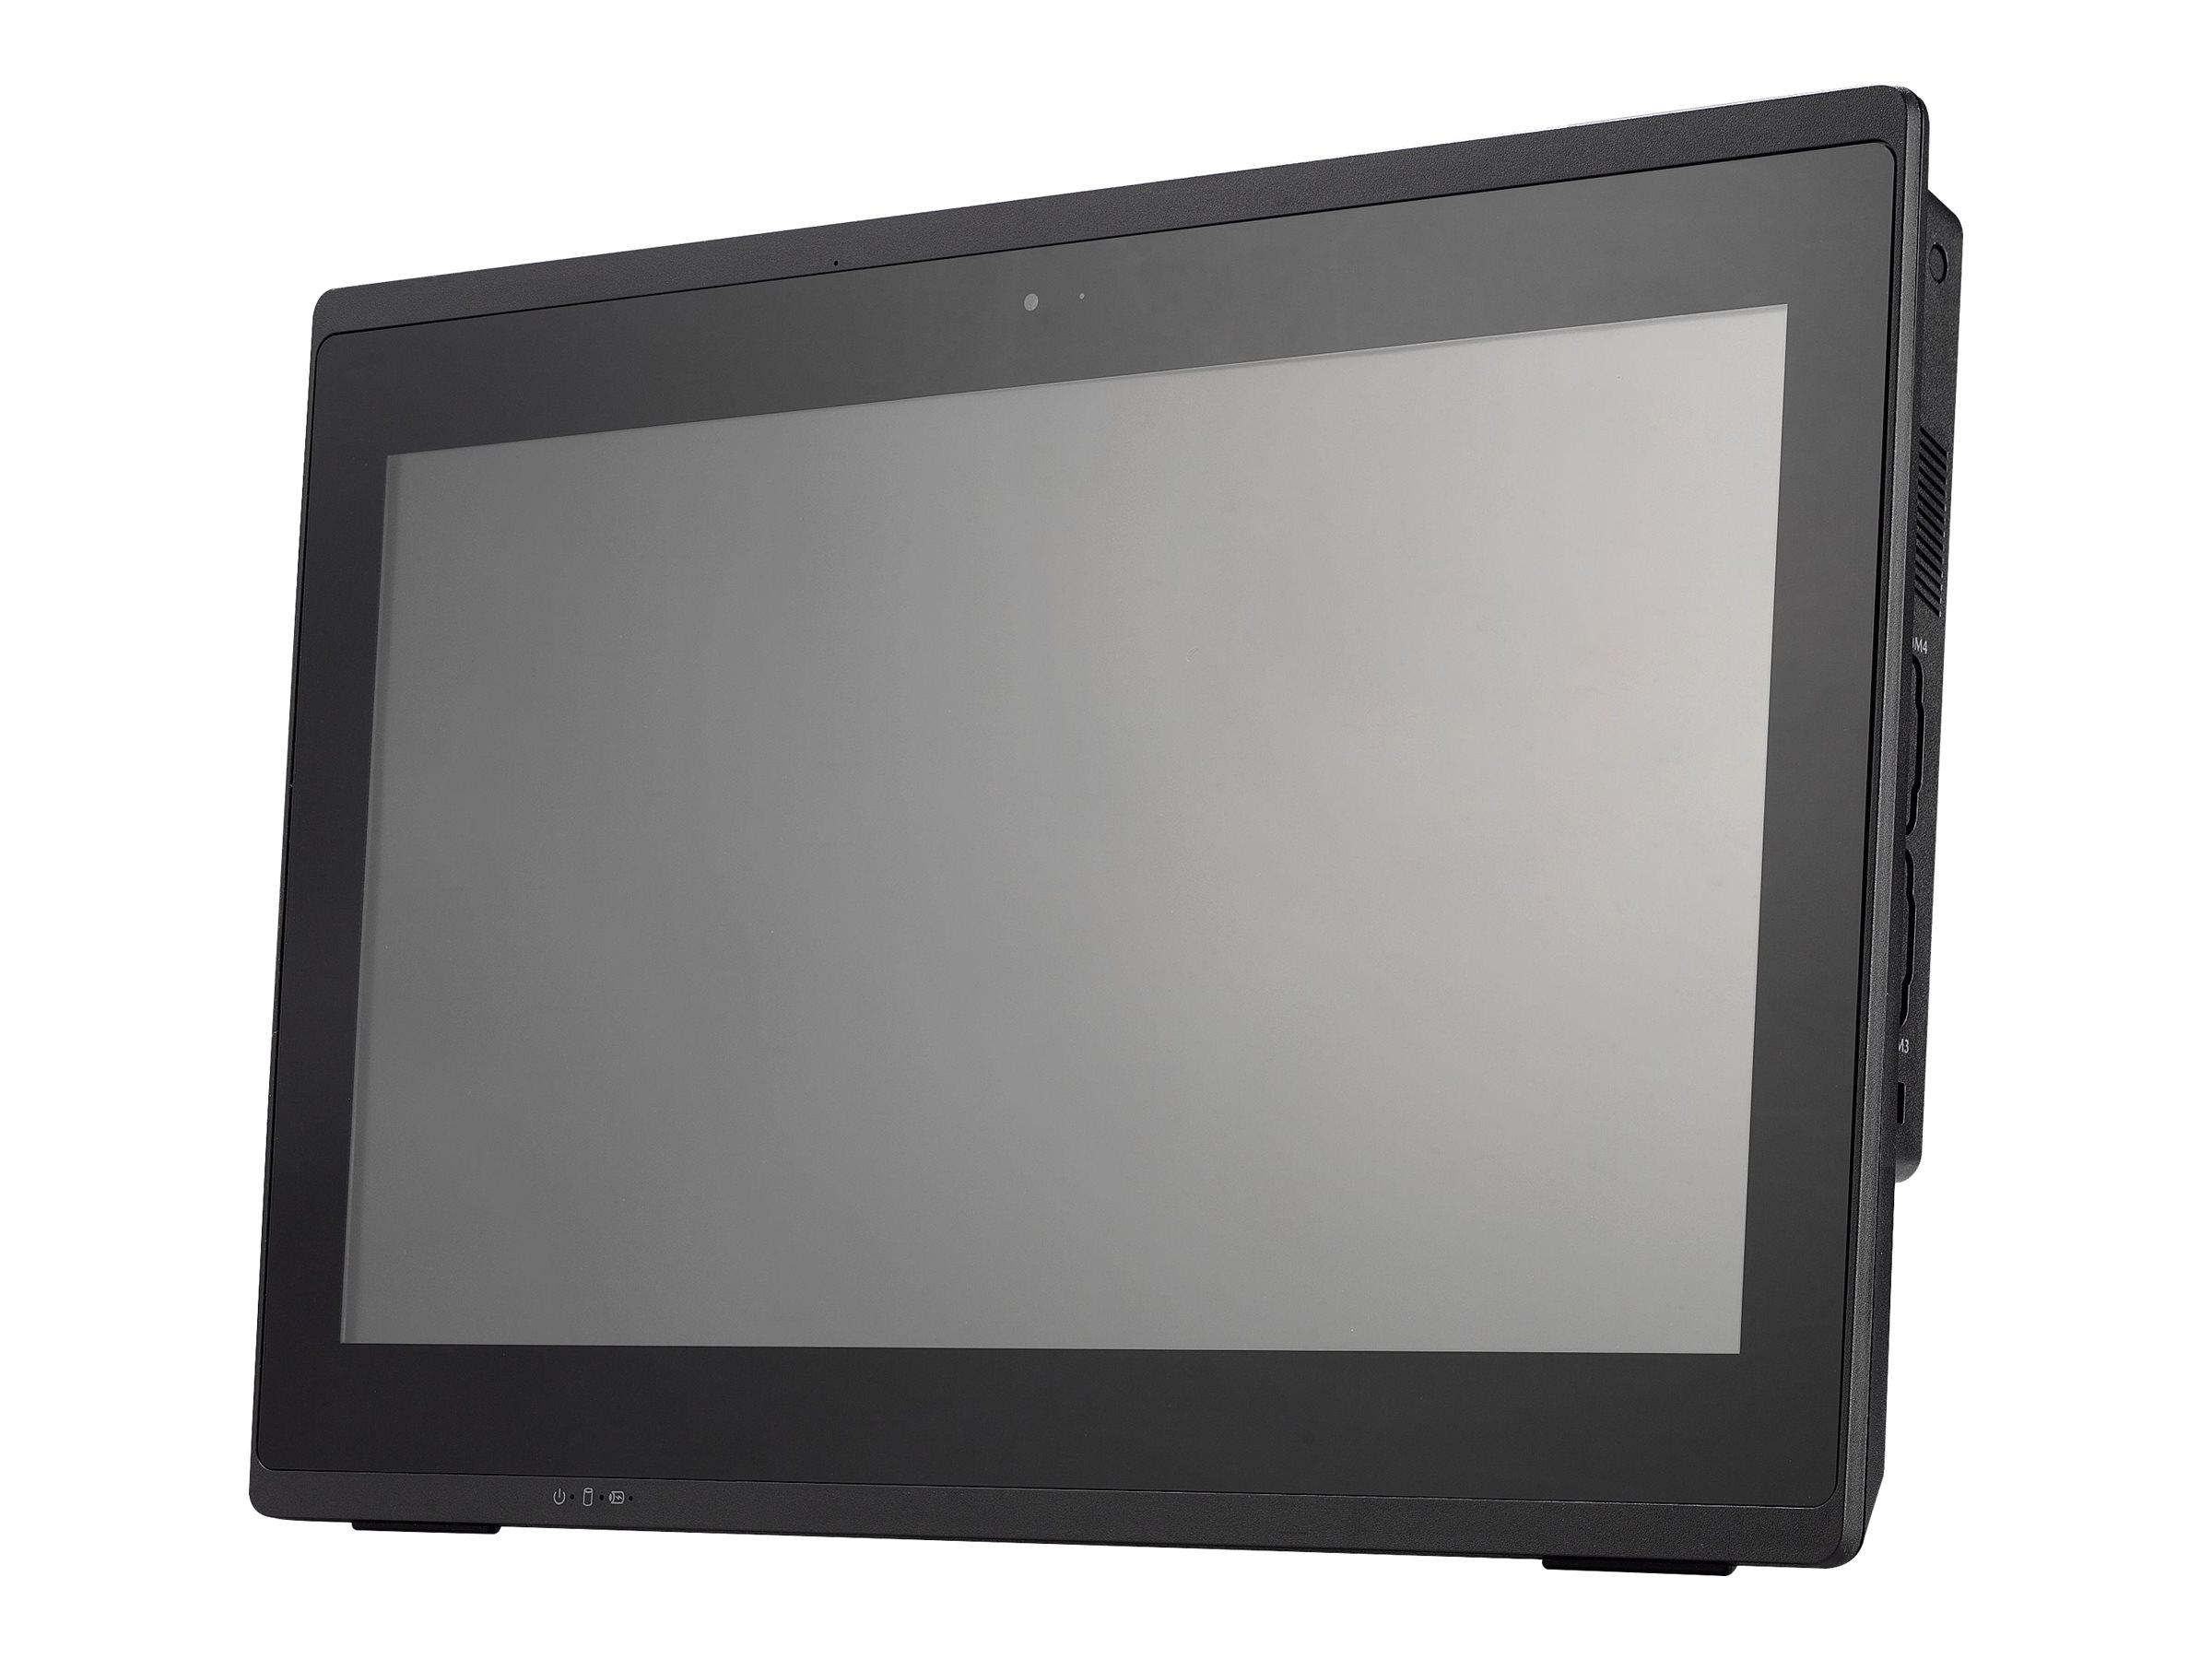 Shuttle XPC P5100PA - All-in-One (Komplettlösung) - 1 x Celeron 4205U / 1.8 GHz ULV - RAM 4 GB - SSD 120 GB - HD Graphics 610